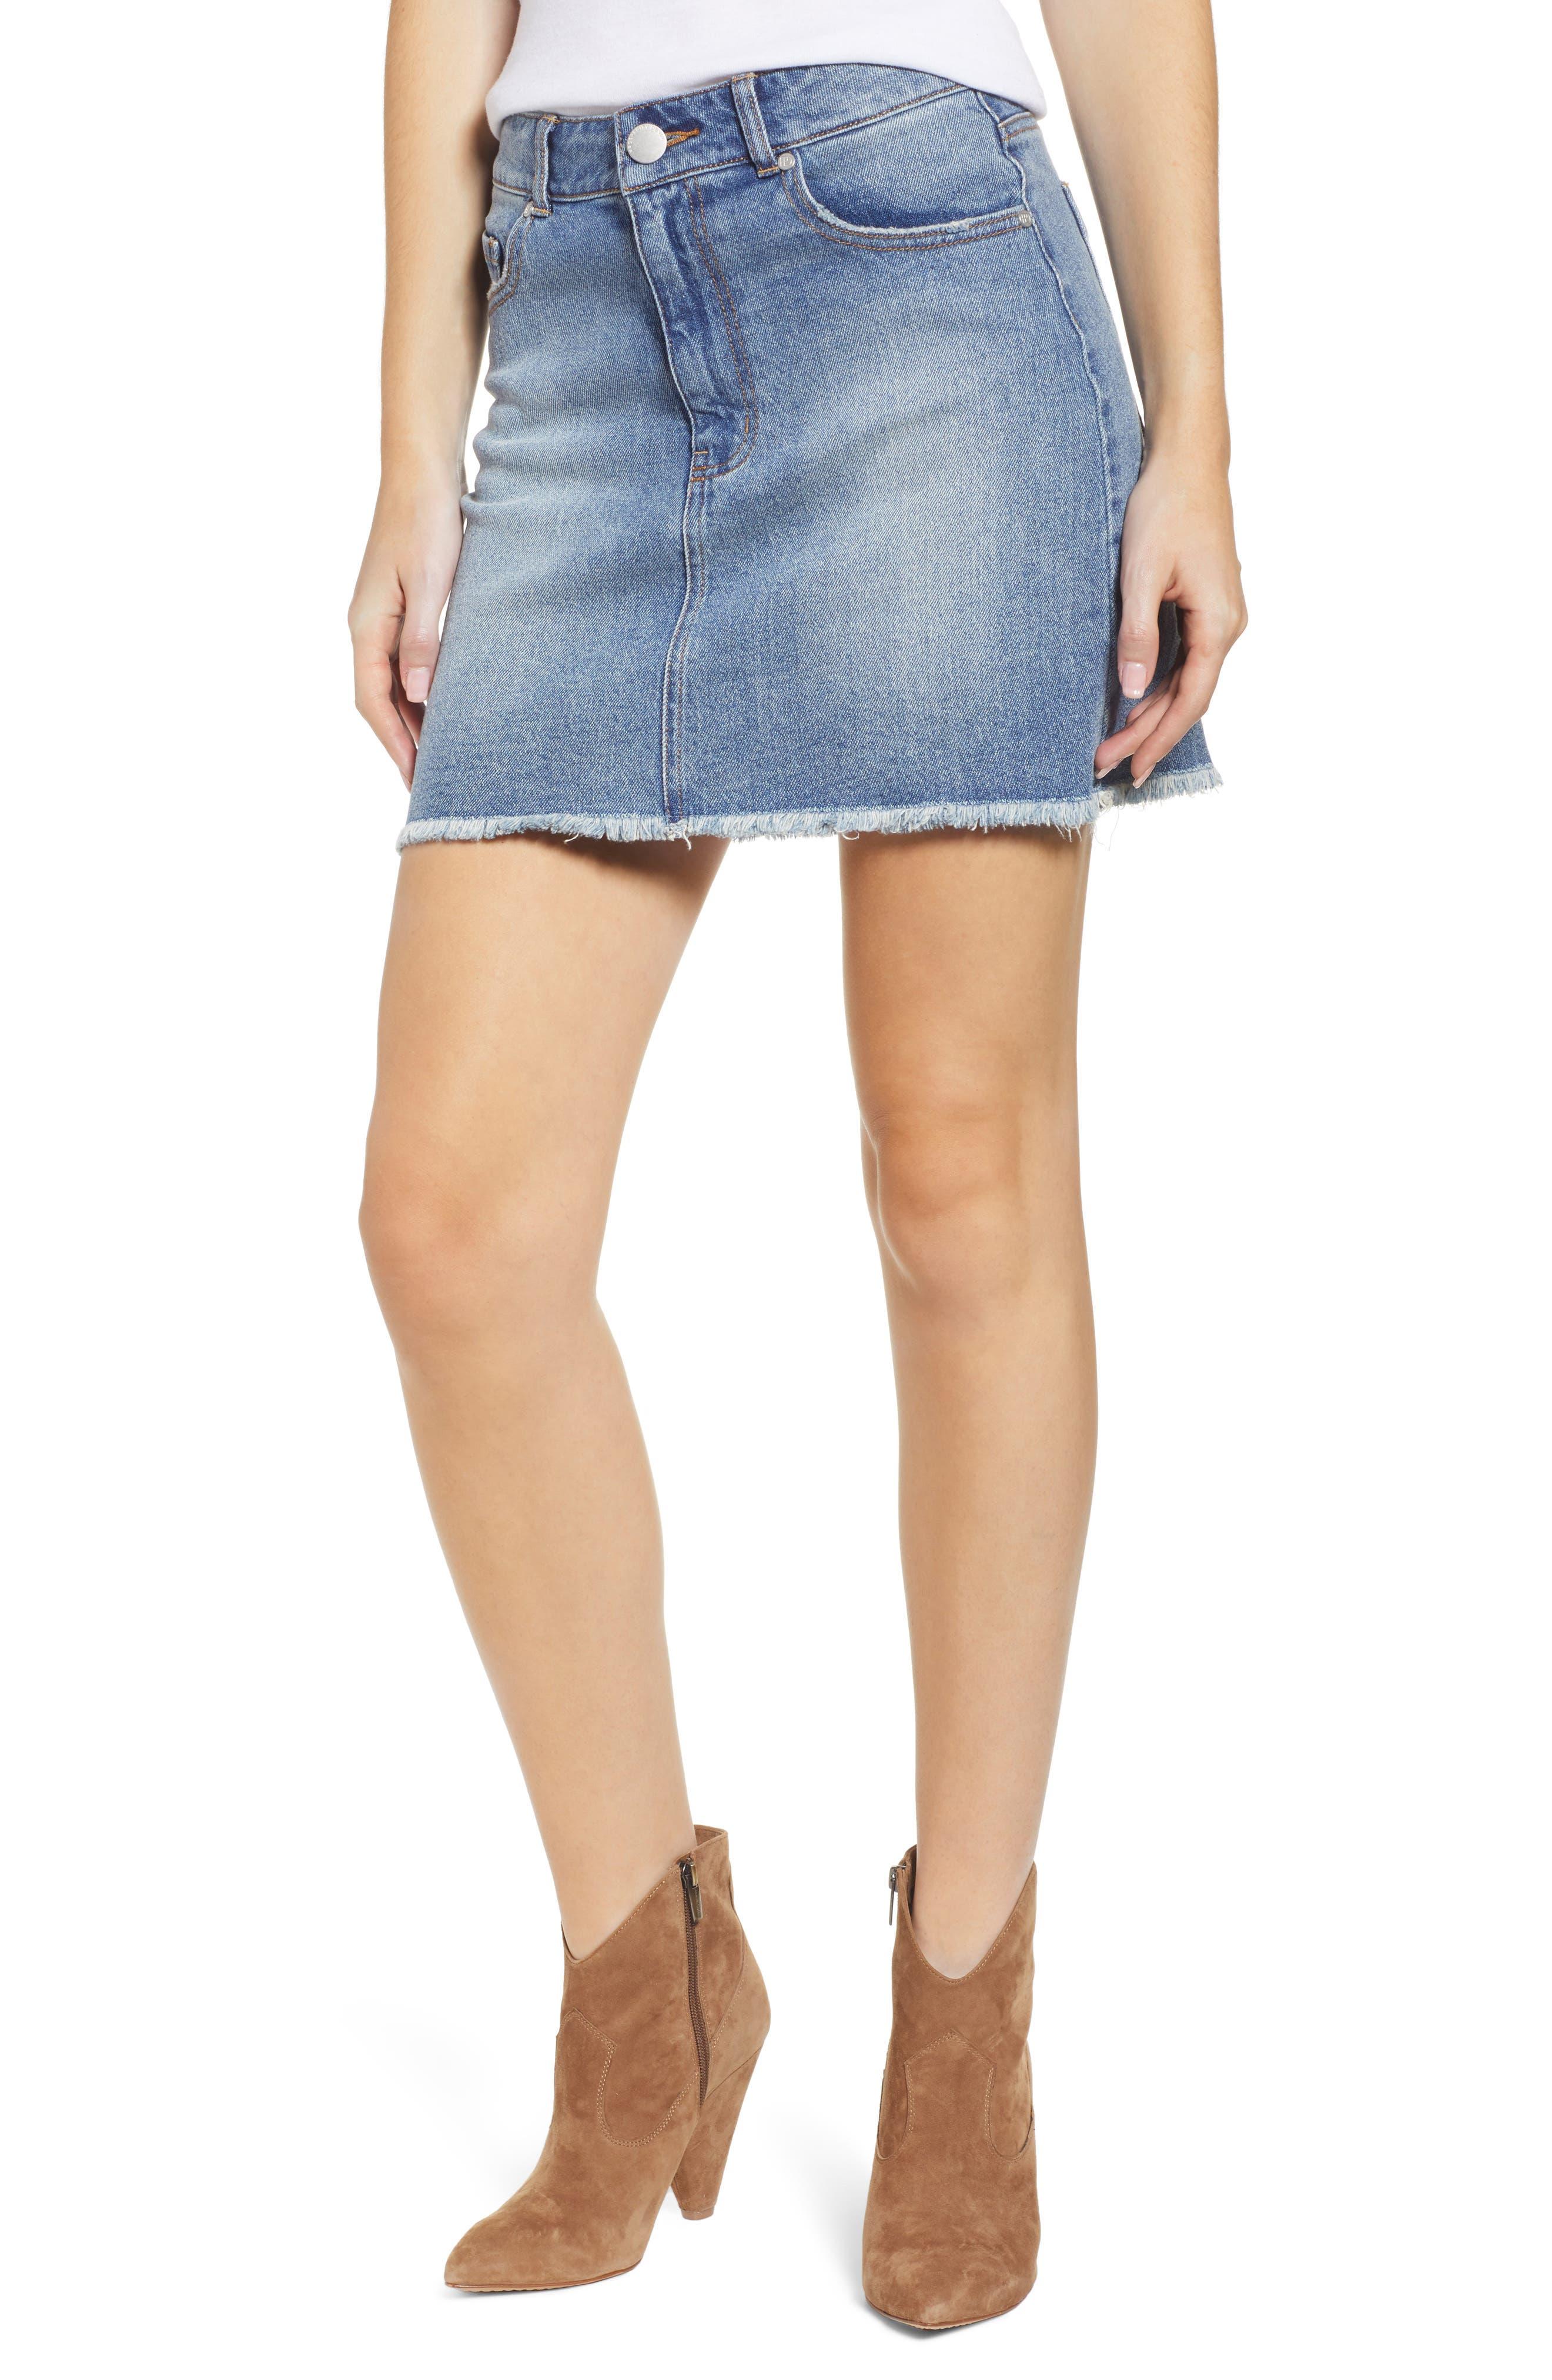 PROSPERITY DENIM Raw Hem Denim Miniskirt, Main, color, LIGHT WASH